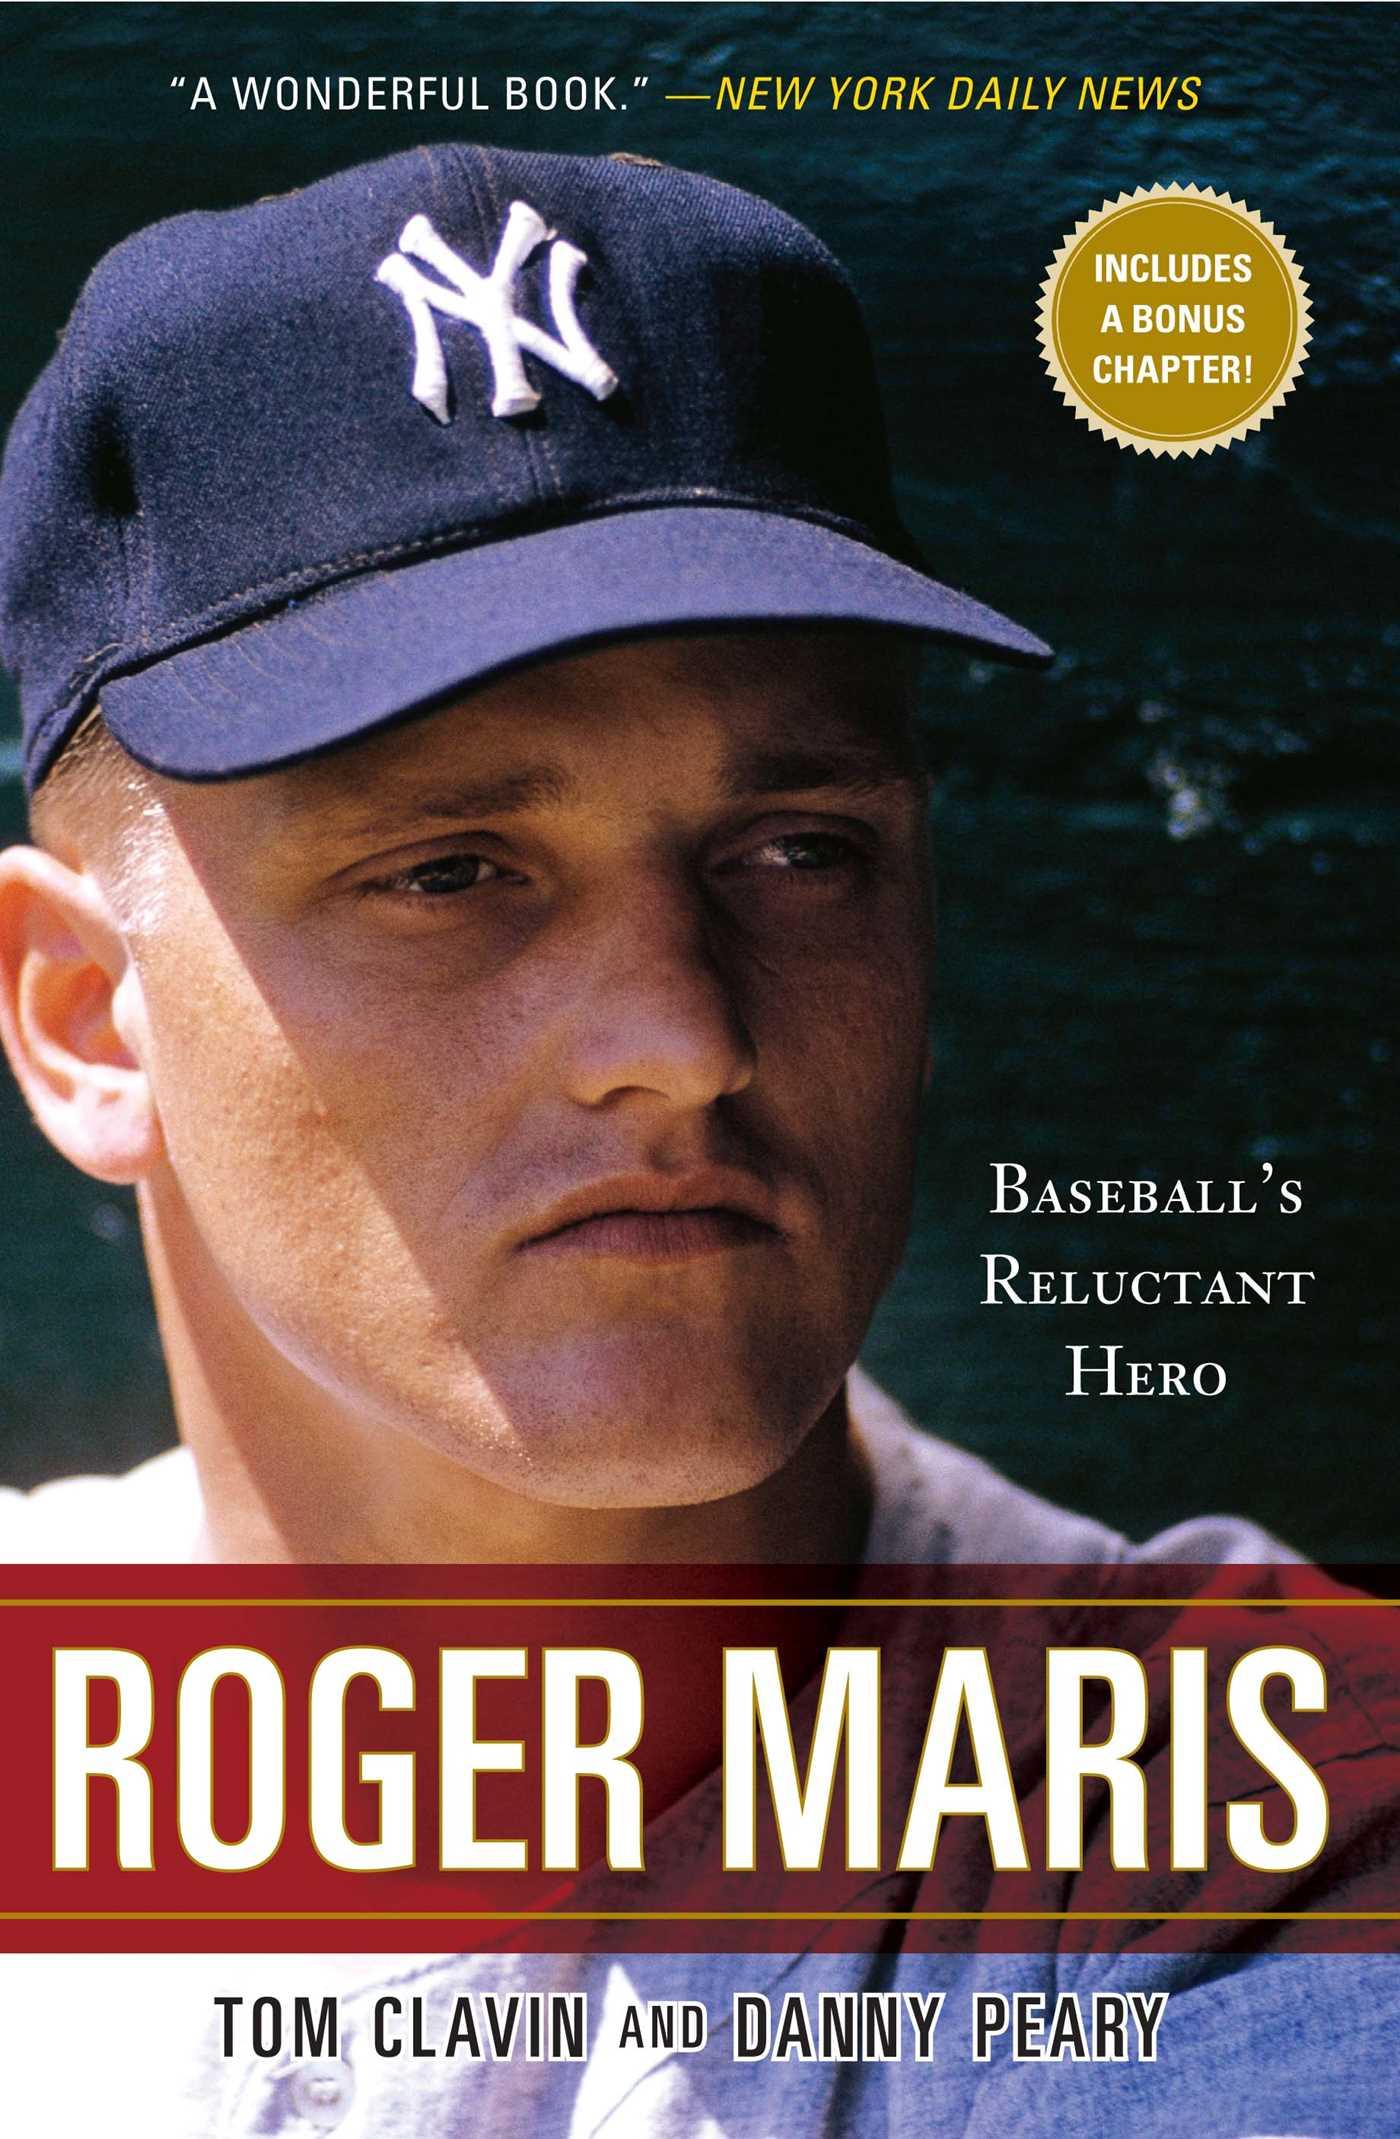 Roger maris 9781416589297 hr